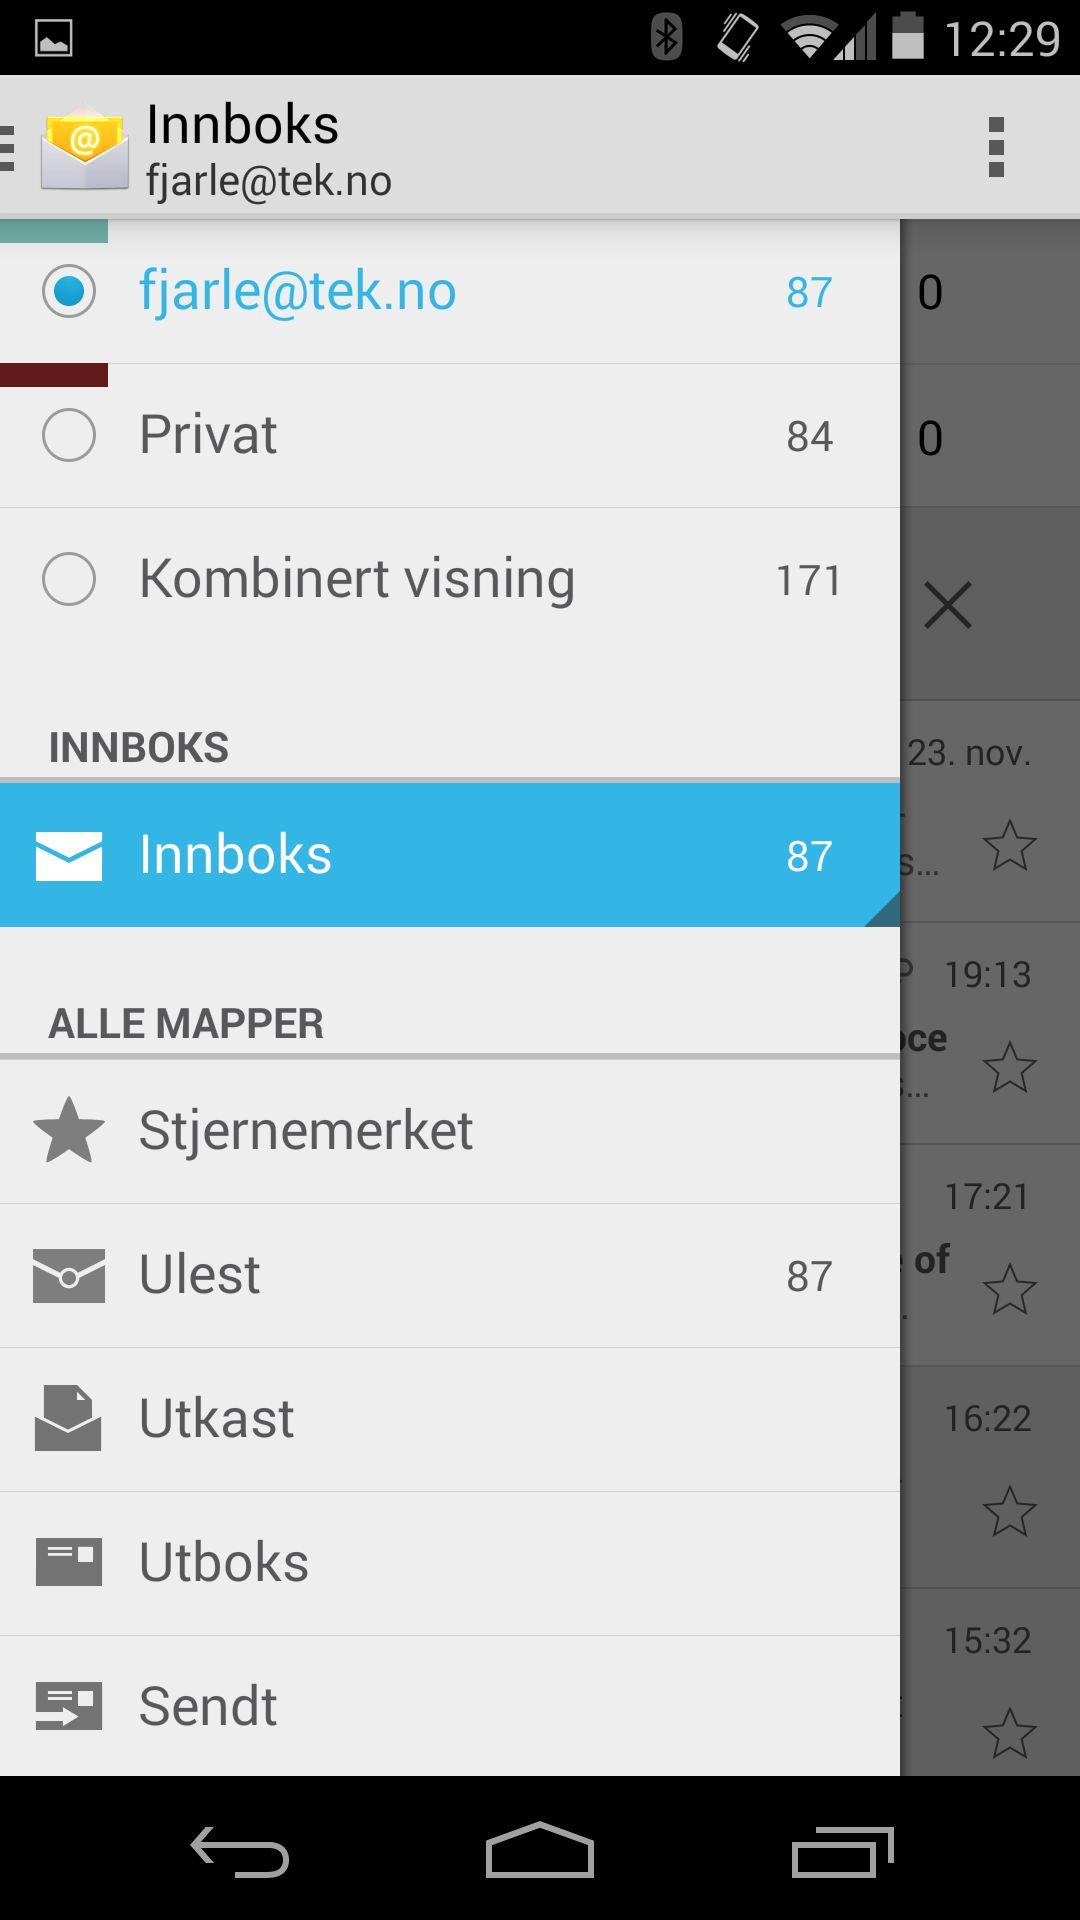 Den nye e-postklienten i Android 4.4 har samme design som GMail-klienten.Foto: Finn Jarle Kvalheim, Amobil.no